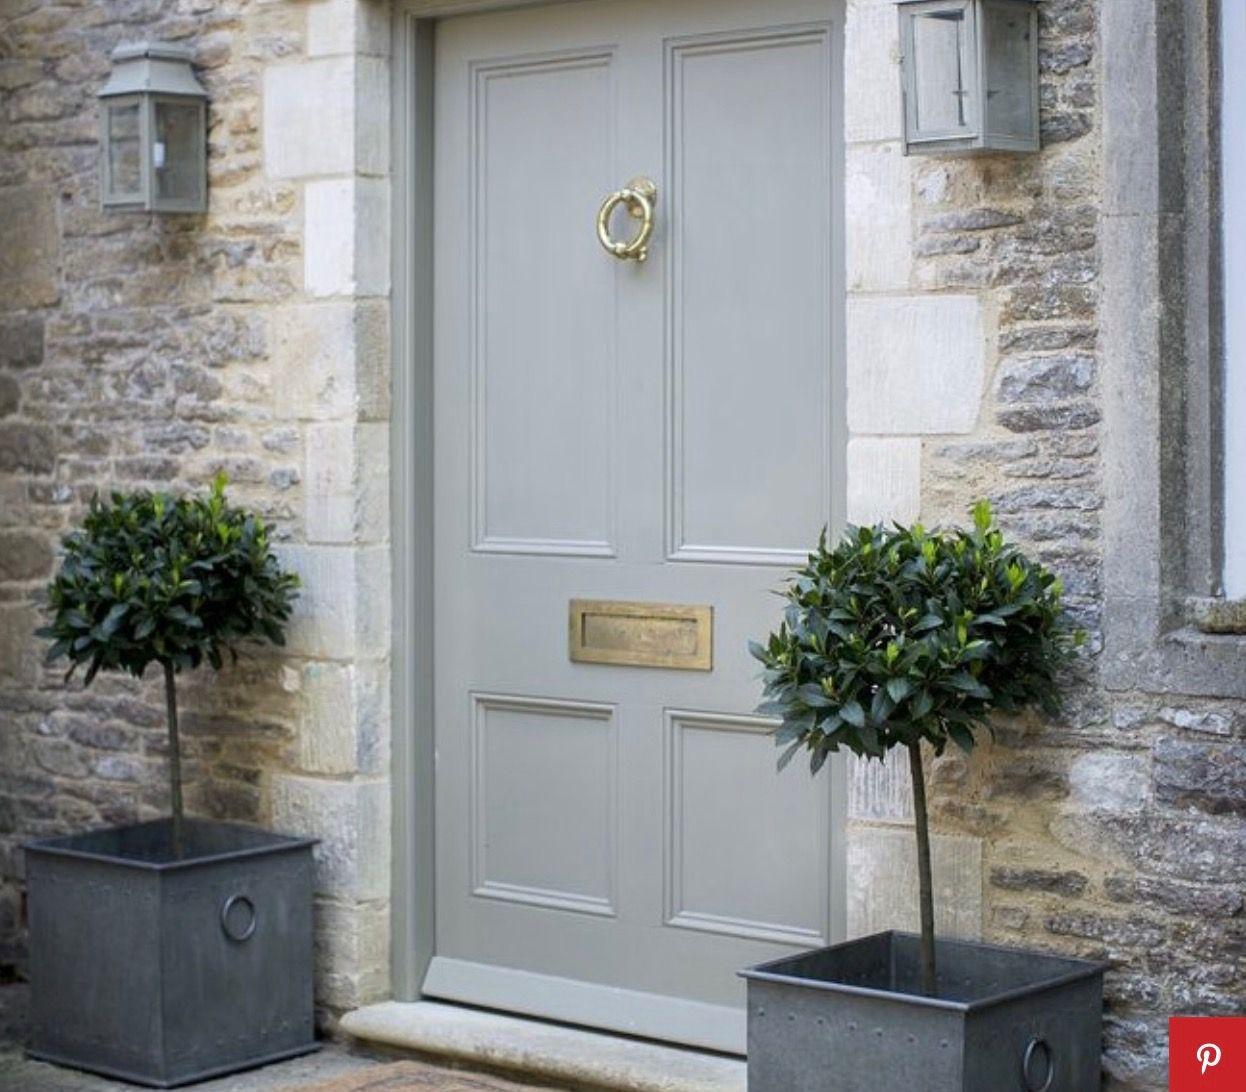 Pin by Emily Peat on Front Door / Porch | Pinterest | Front doors ...